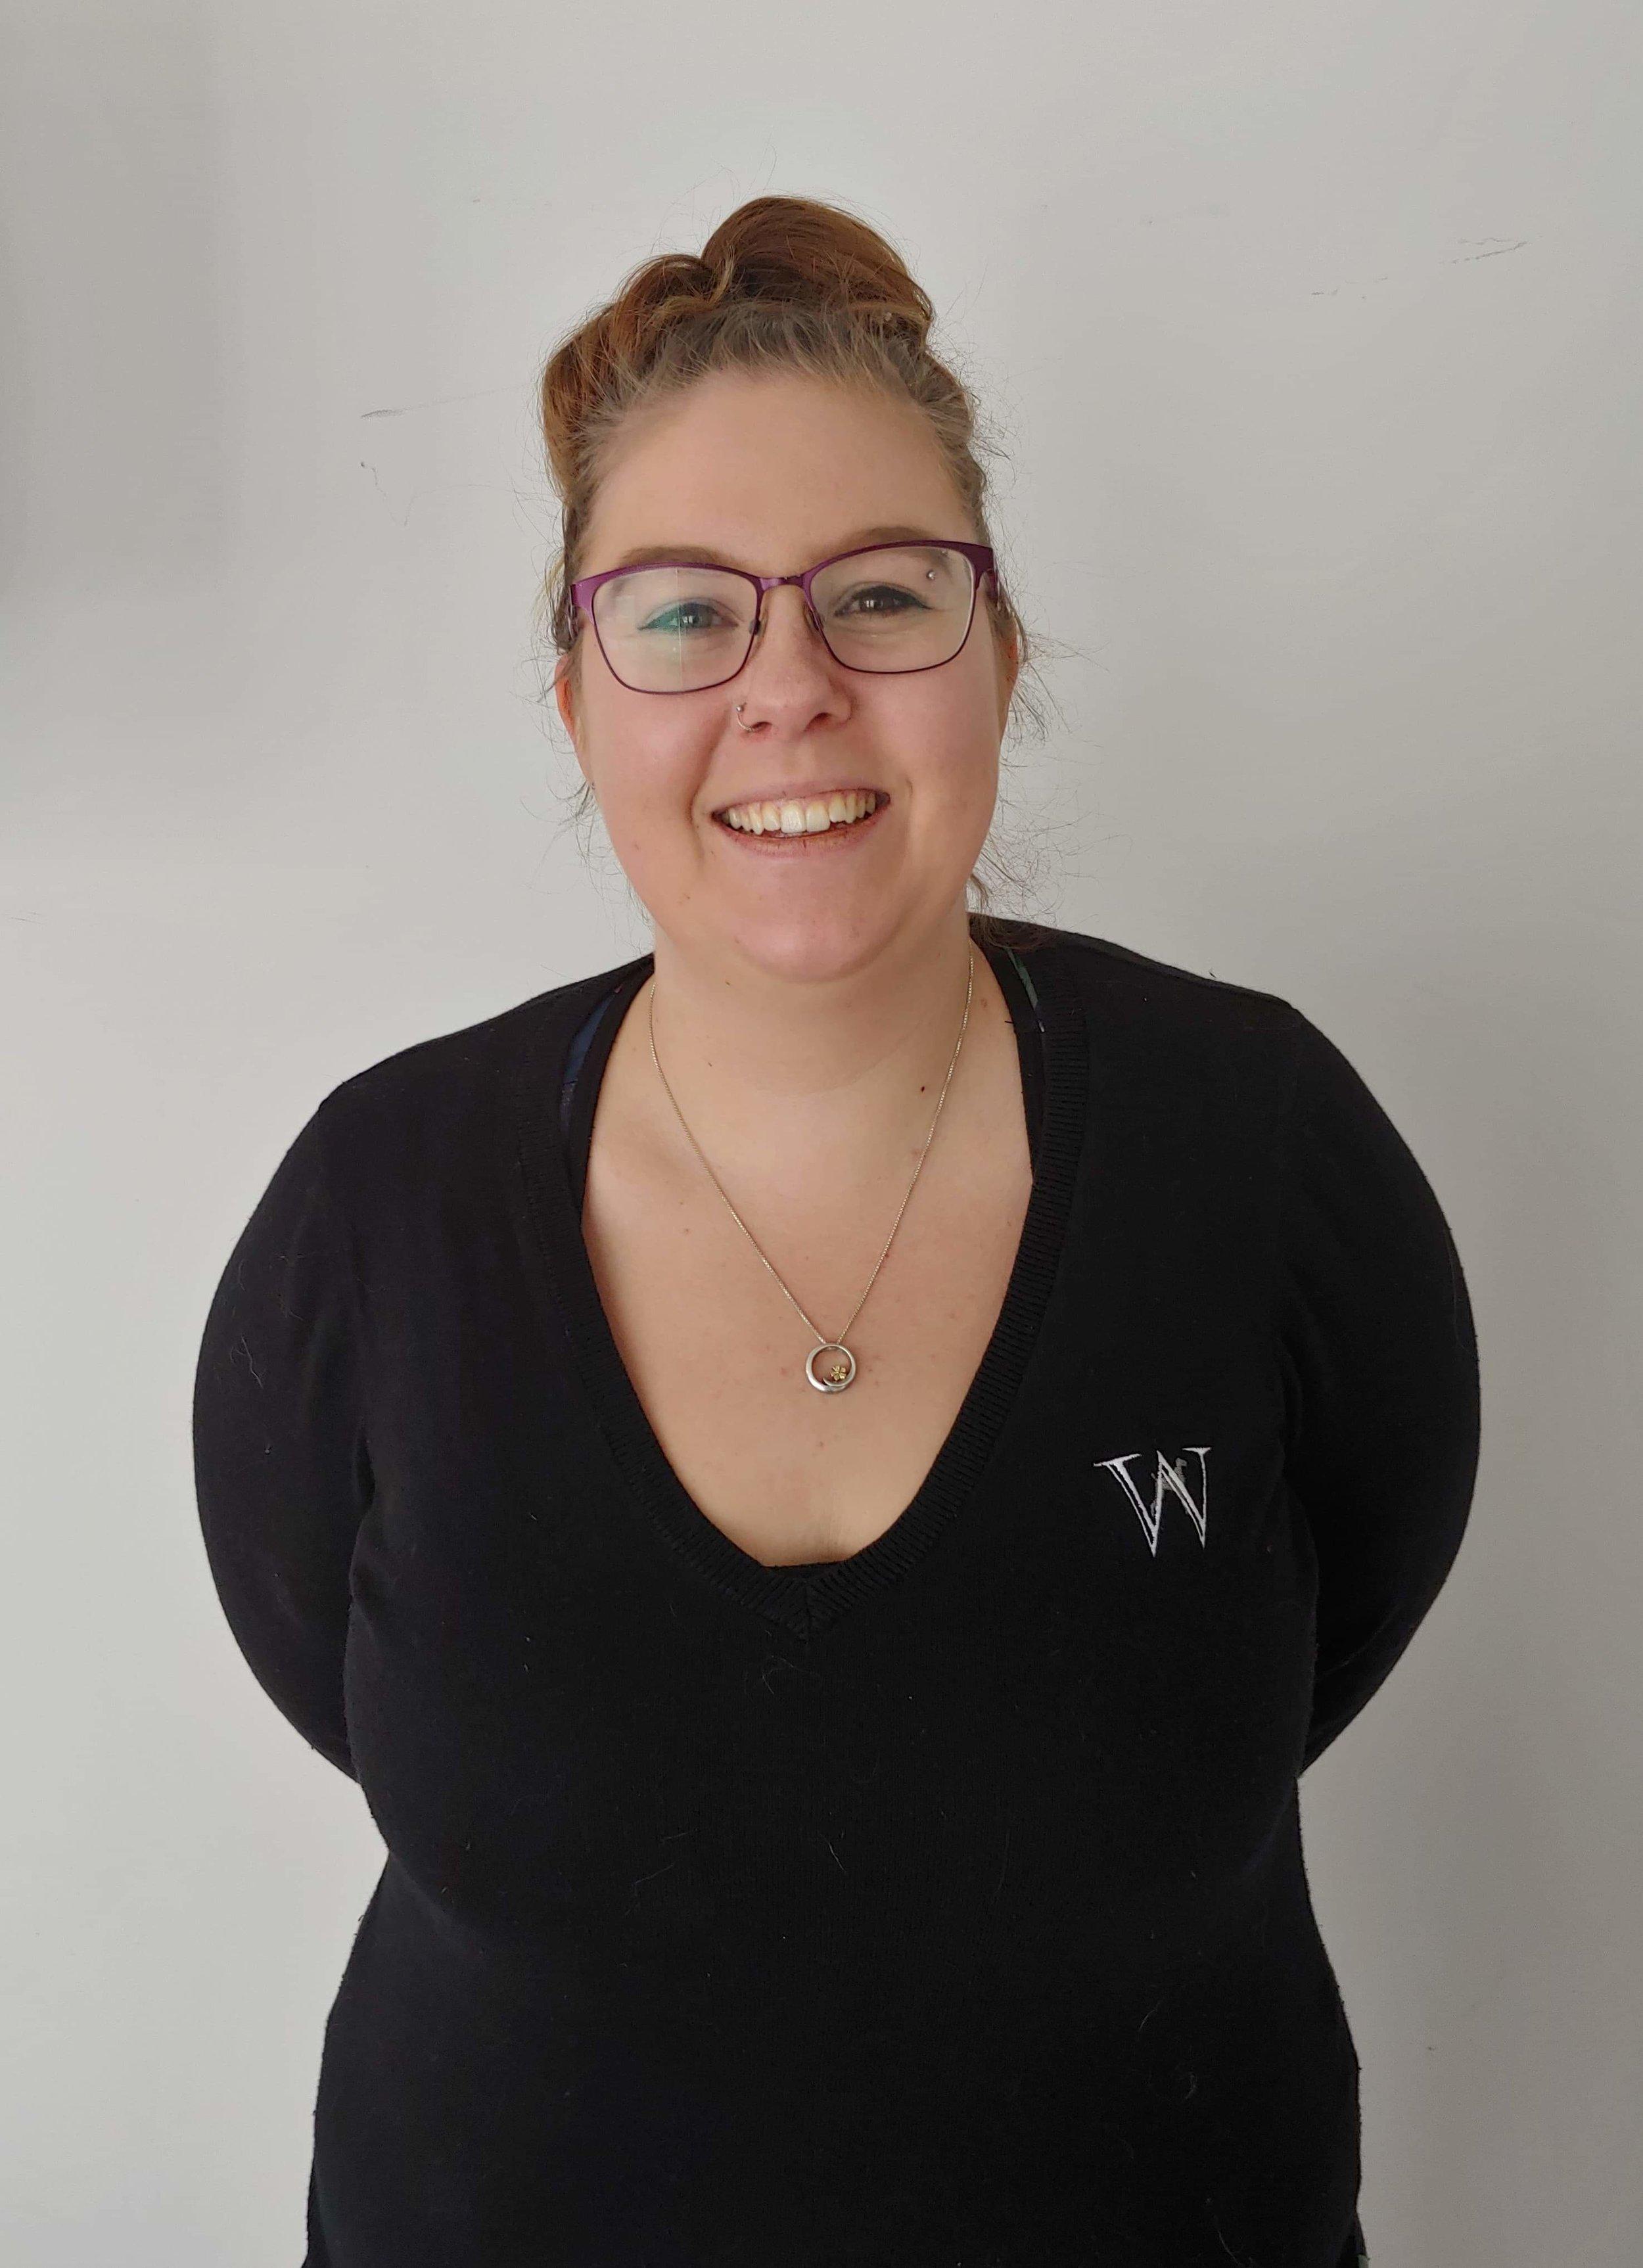 Chelsea Buhler, Pack Leader